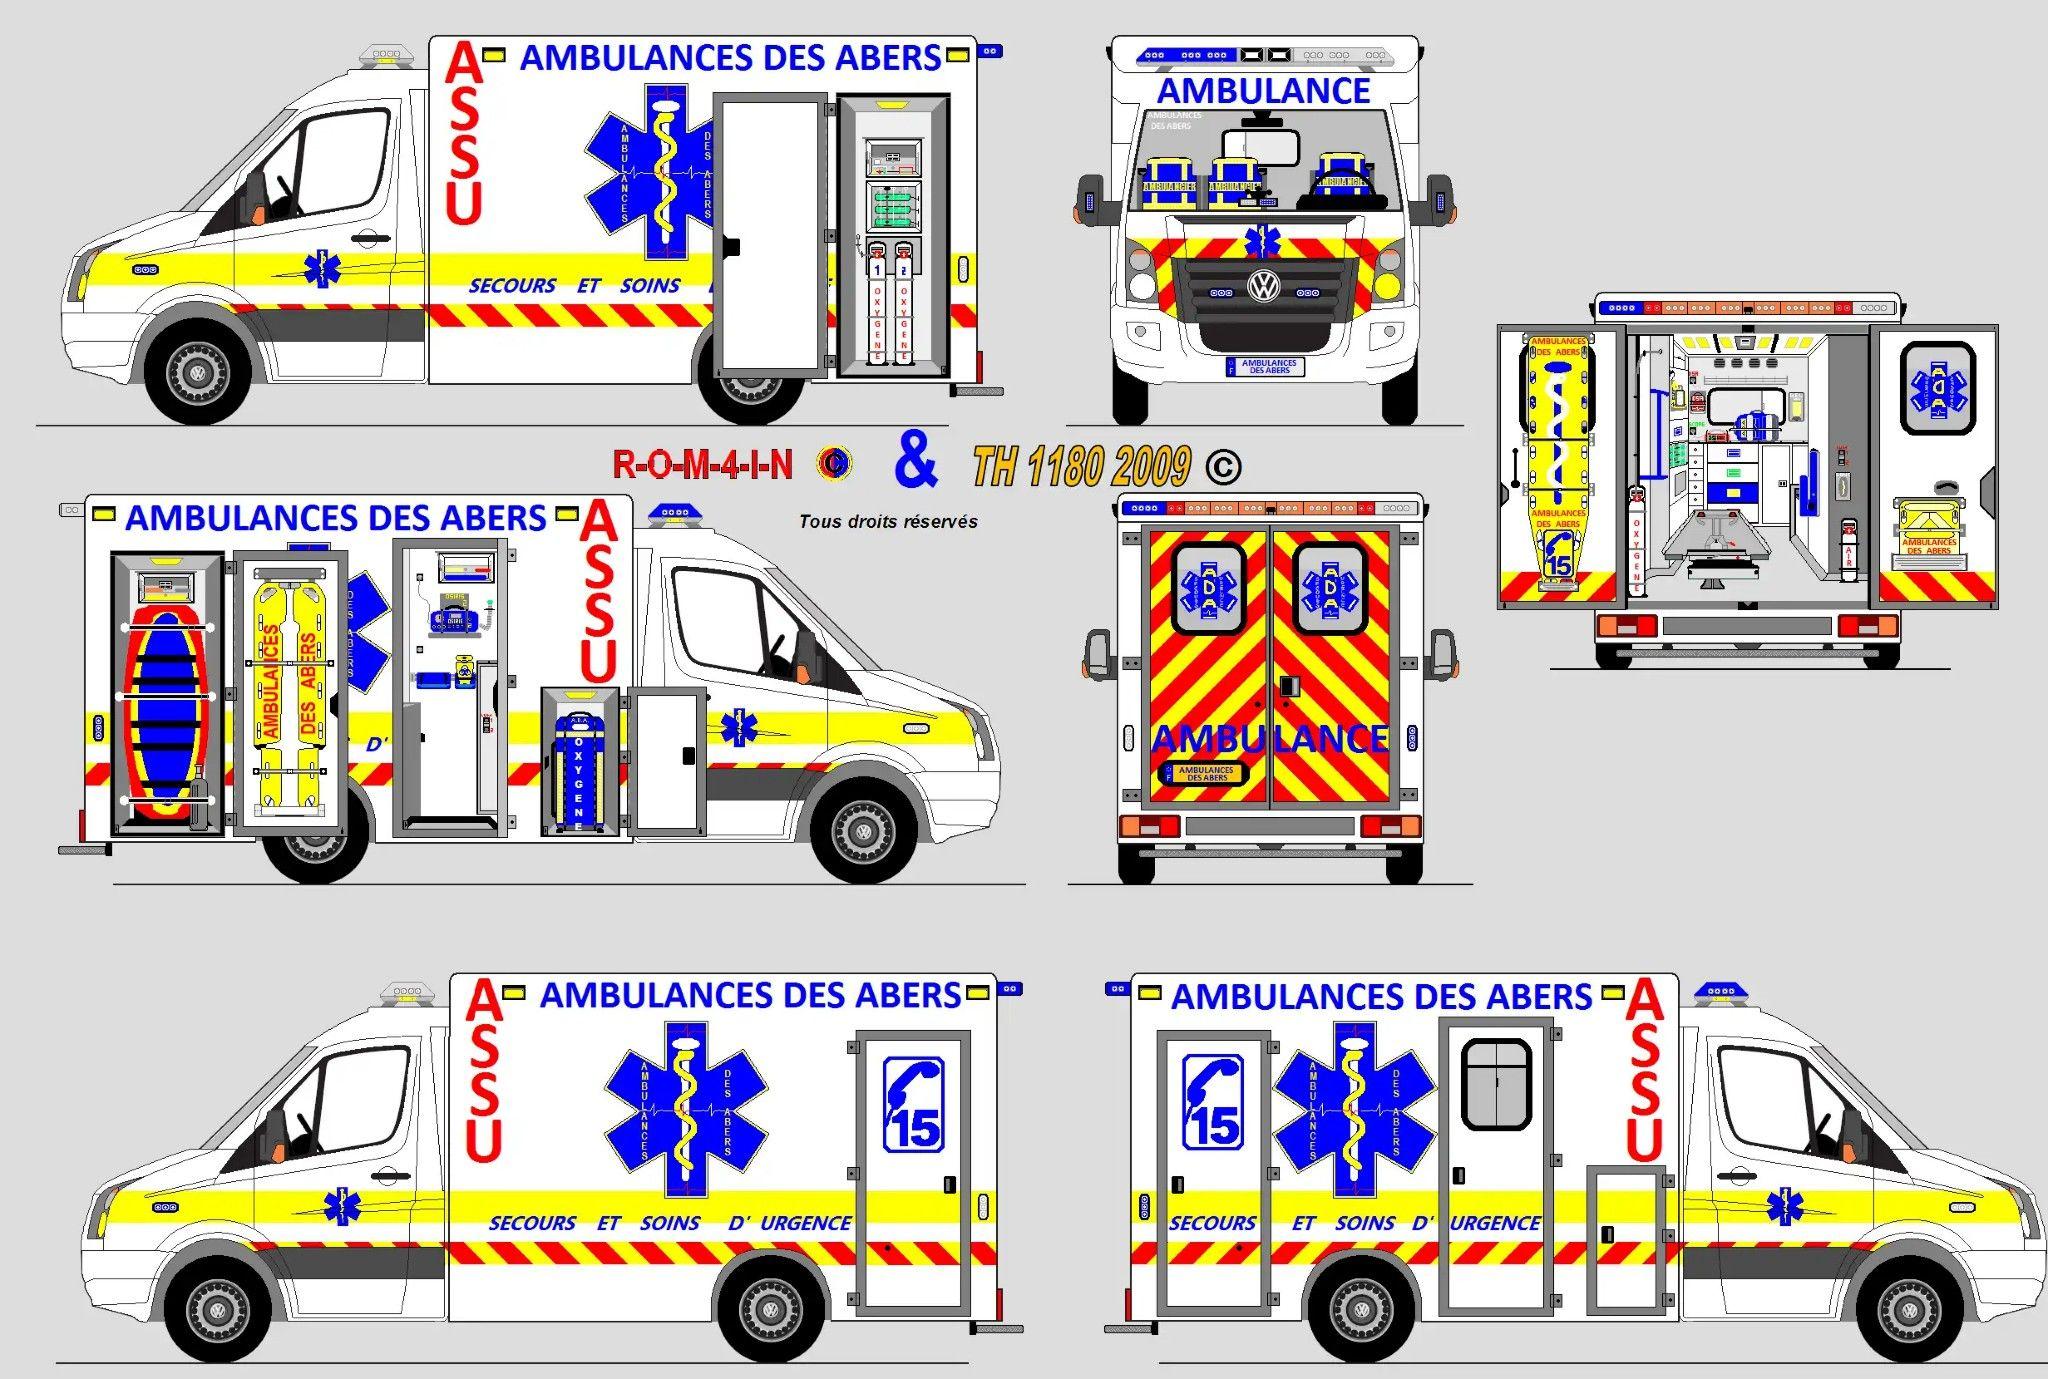 Pin By Geraldo Vasconcellos On Pixel Car Car Sticker Design Emergency Vehicles Pixel Car [ 1379 x 2048 Pixel ]